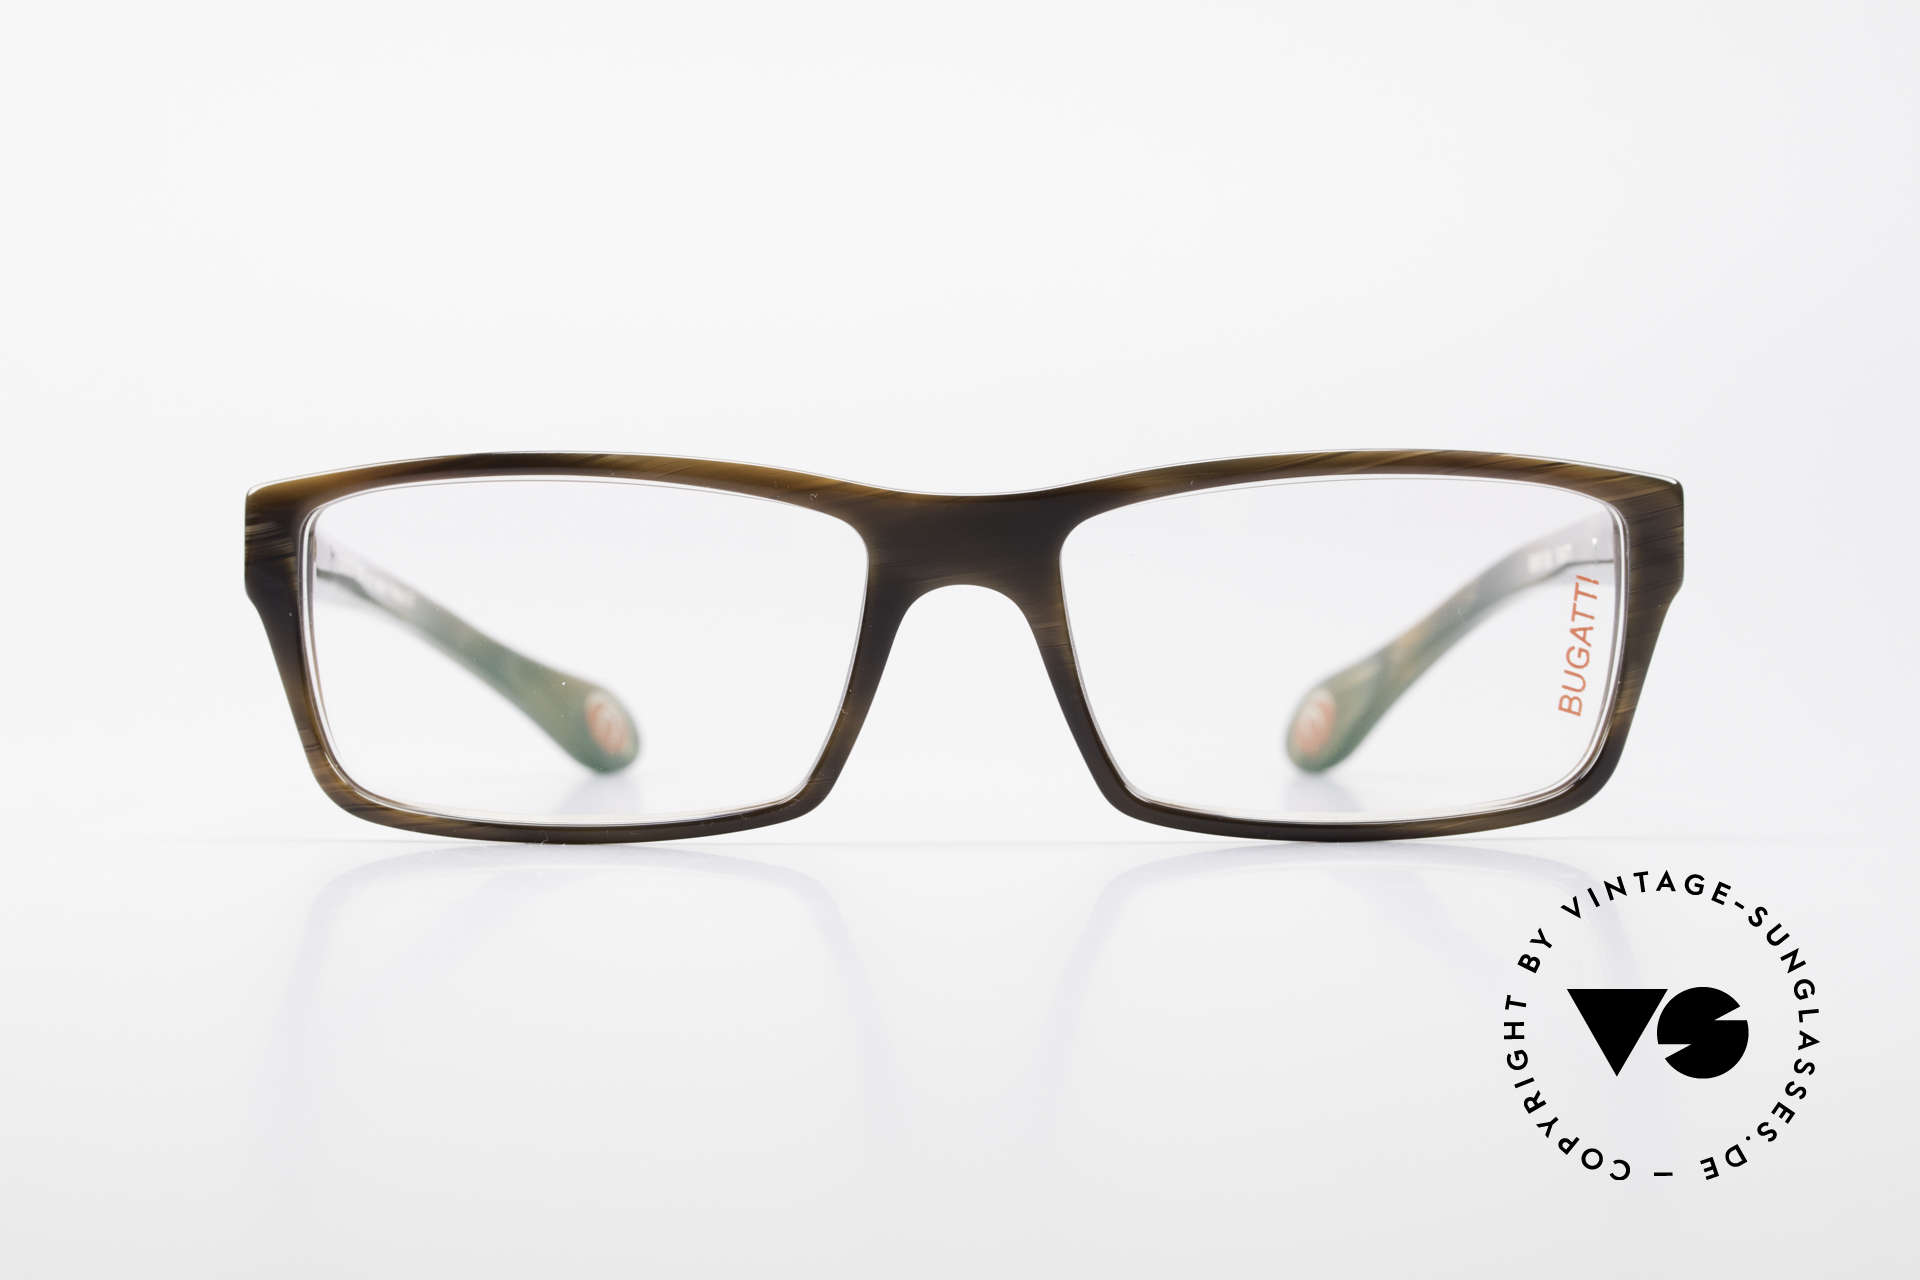 Bugatti 487 Striking Designer Glasses Men, TOP-NOTCH quality of all frame components, Made for Men